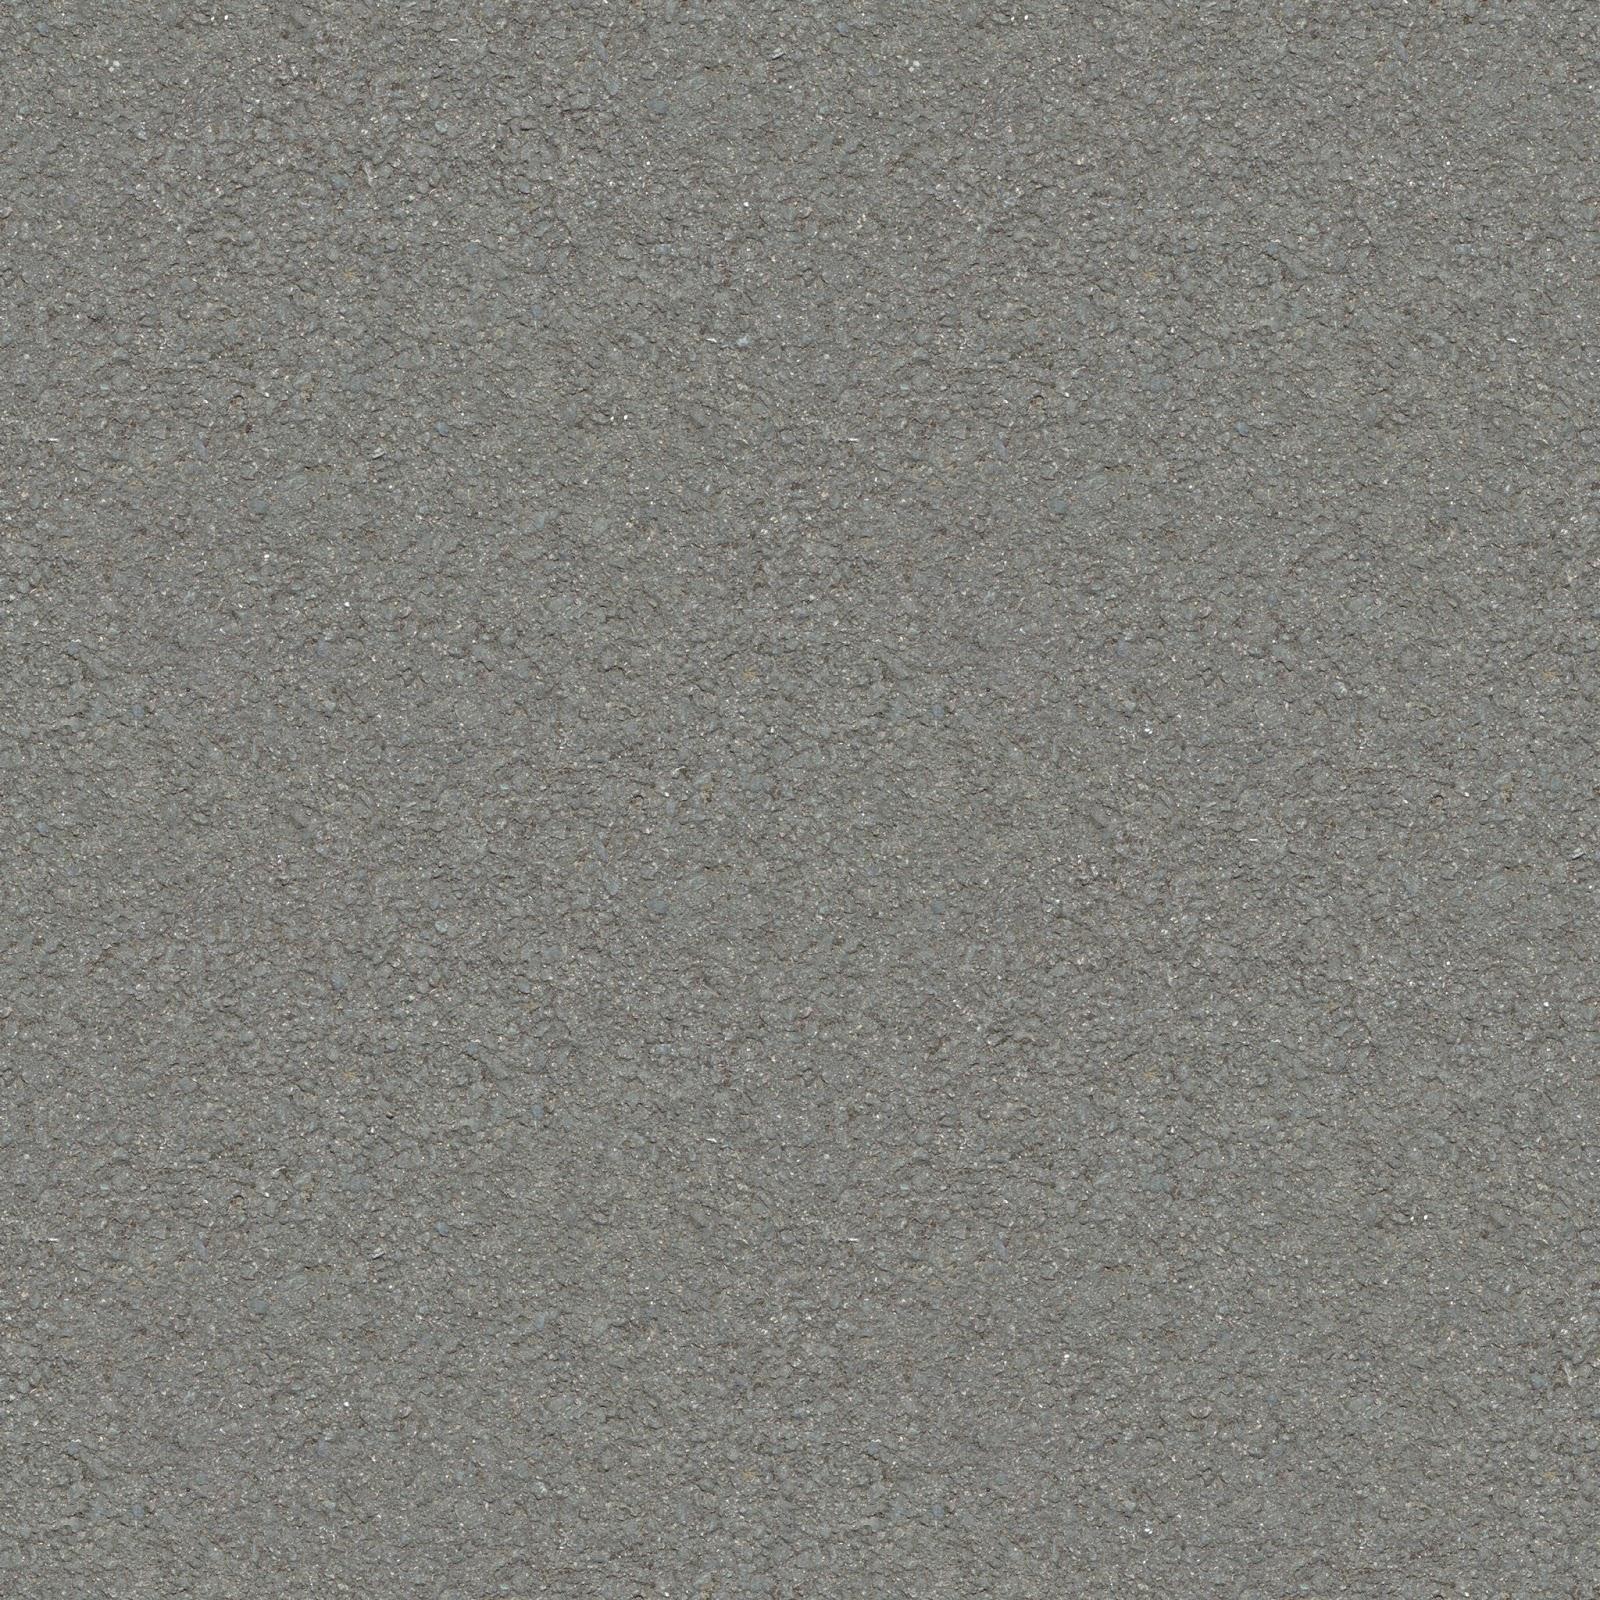 (ASPHALT 1) seamless tarmac road tar texture